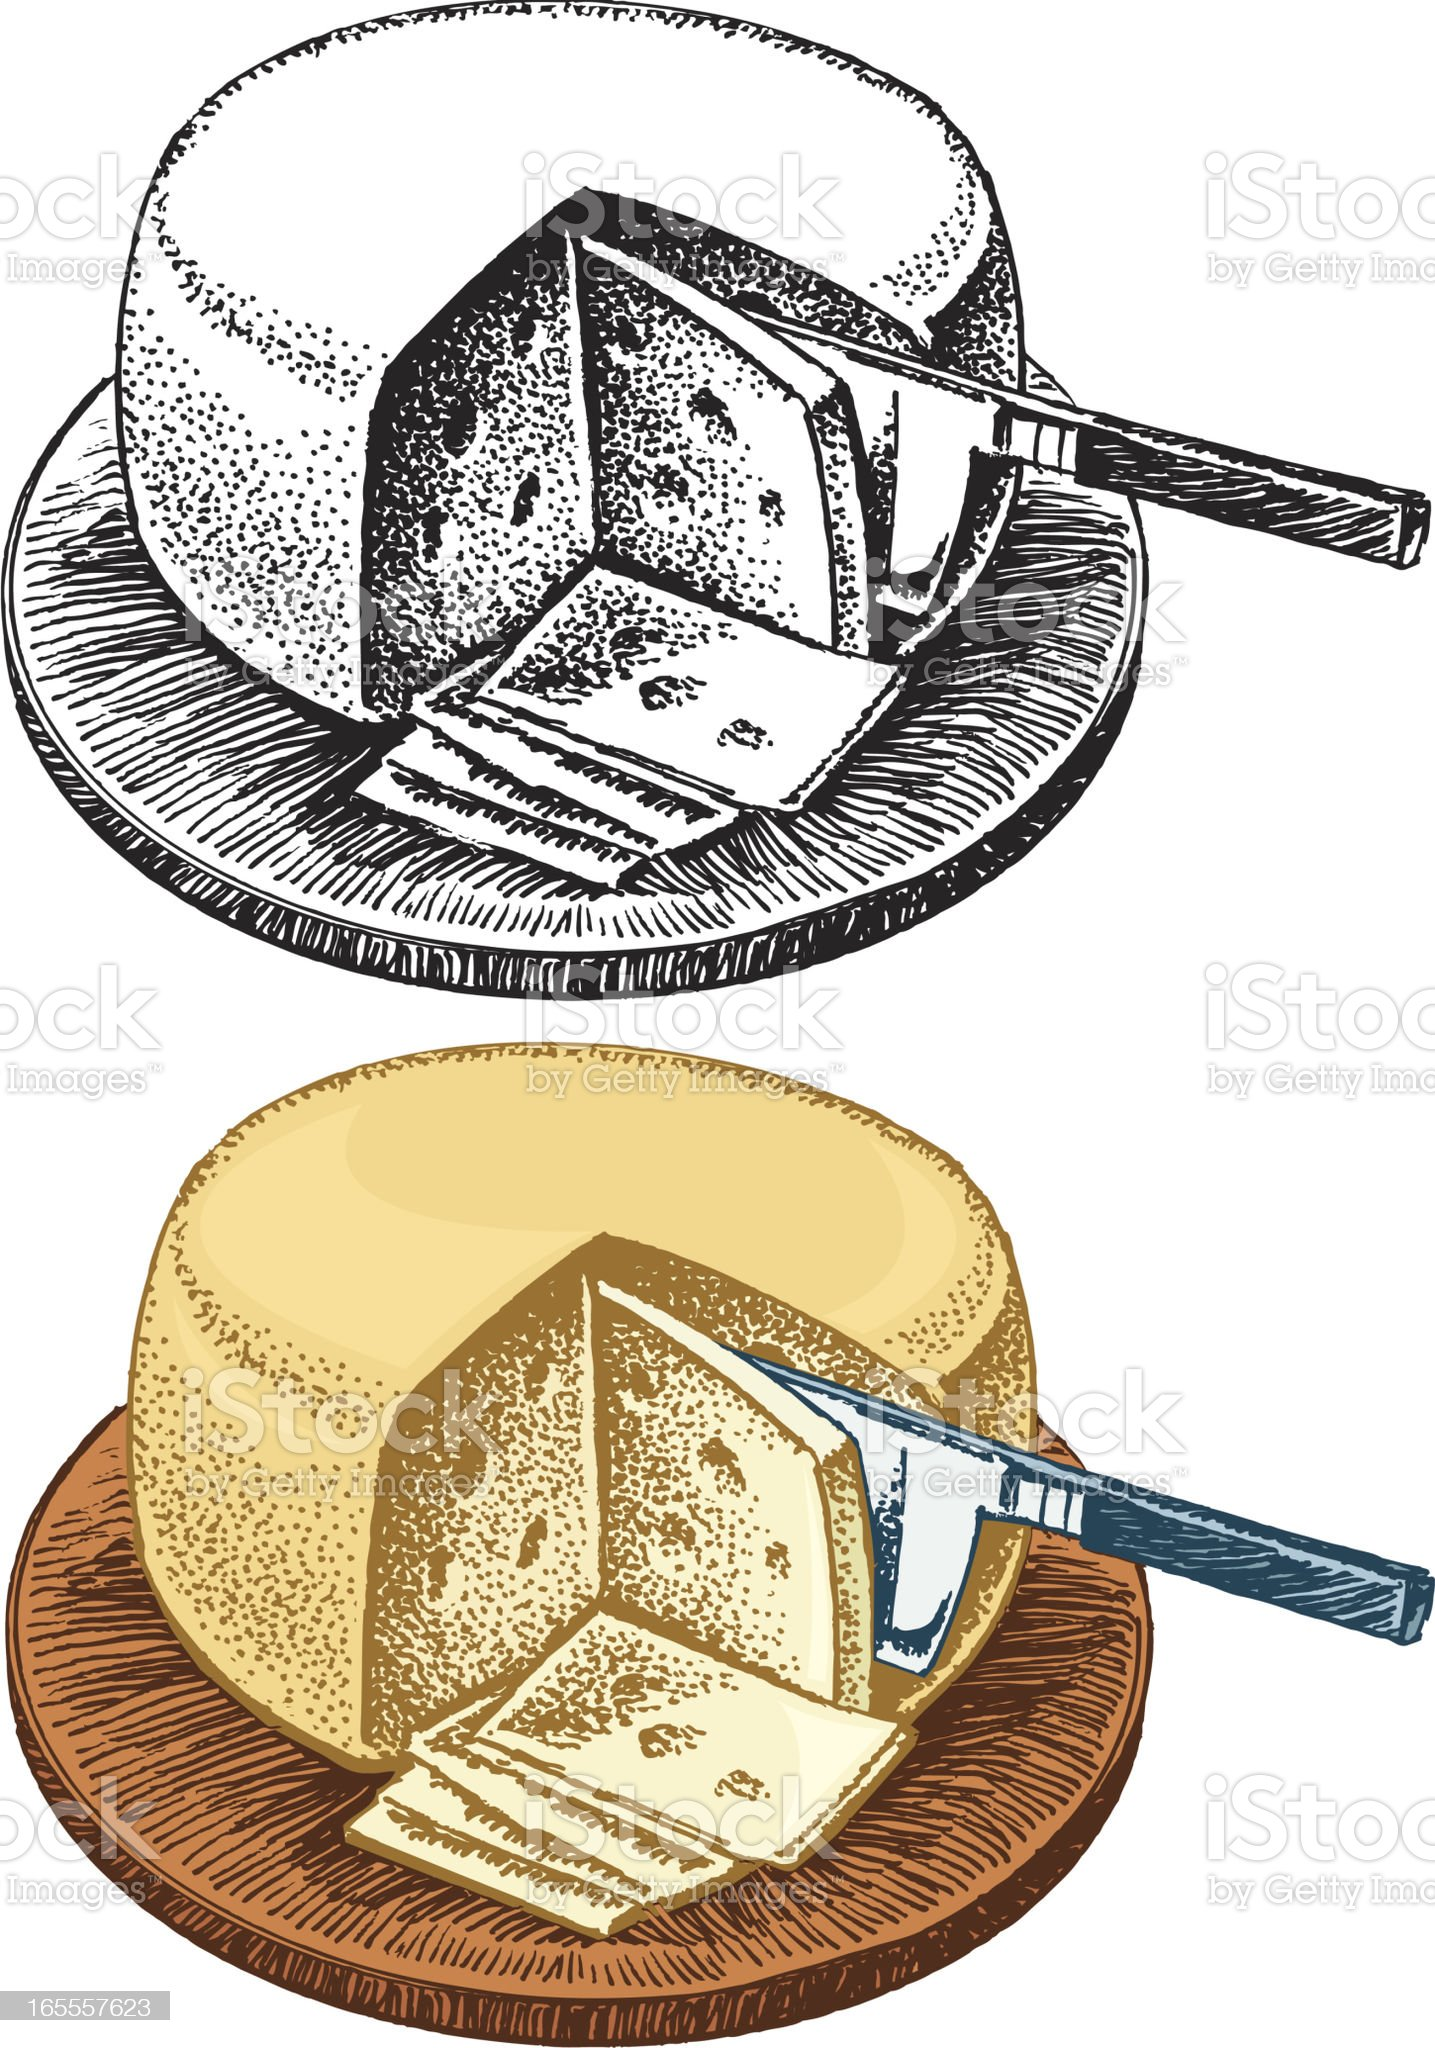 Swiss Cheese Wheel, Appetizer royalty-free stock vector art